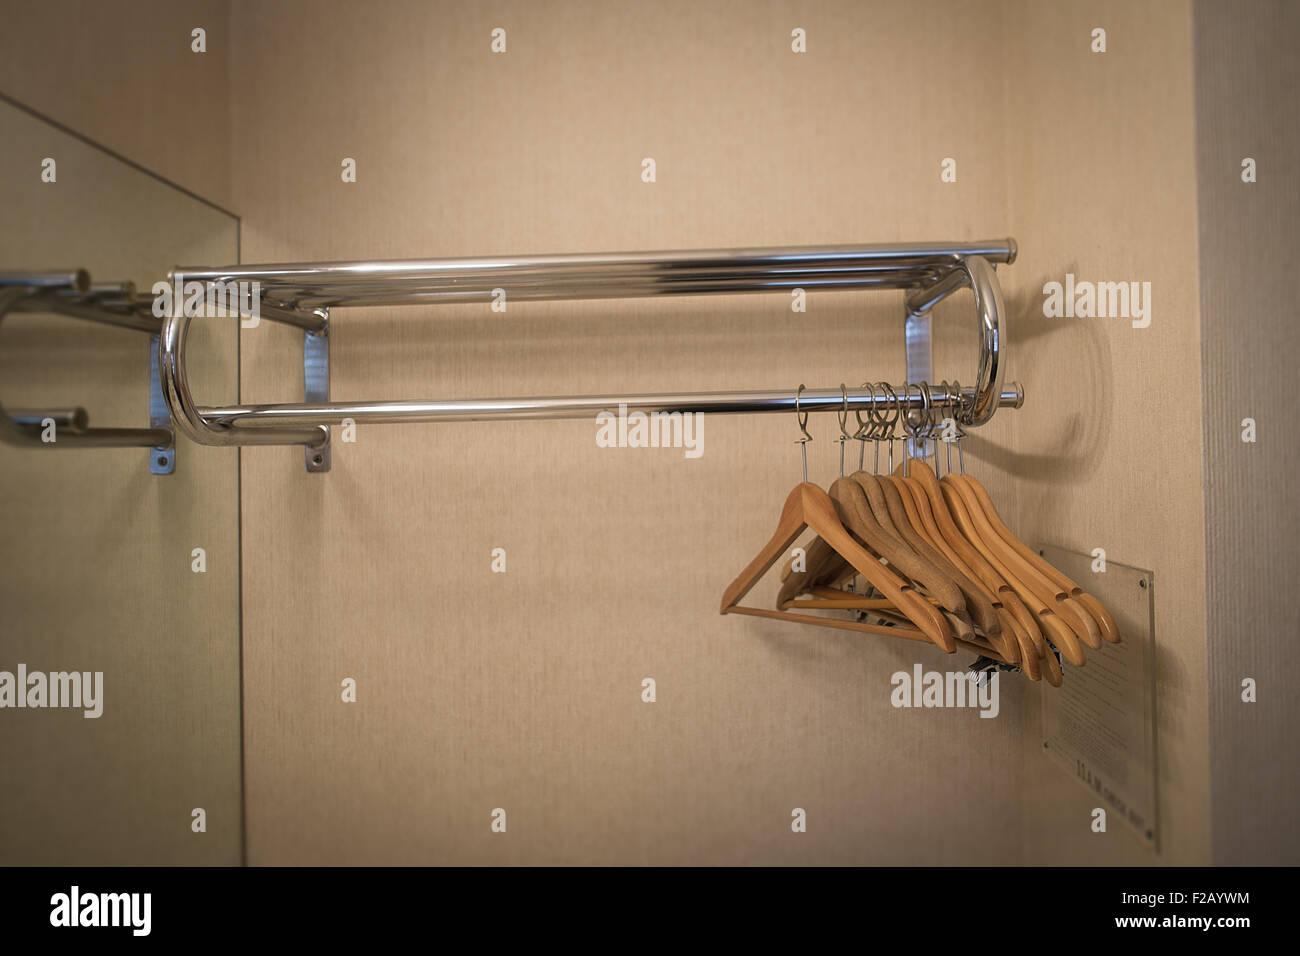 Empty Wooden Hangers on Chrome rail in Motel - Stock Image